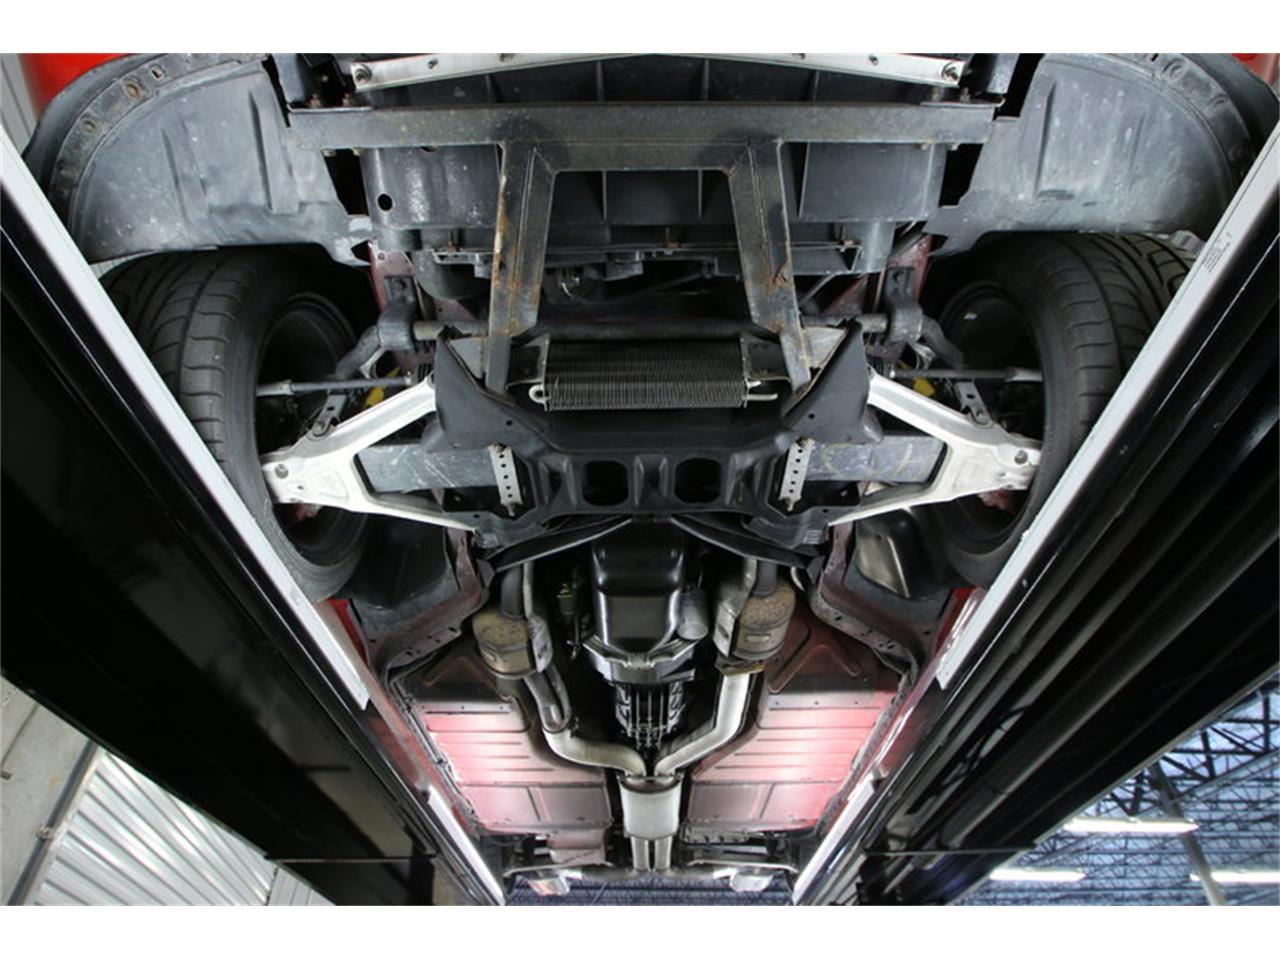 Large Picture of 1995 Chevrolet Corvette located in Lutz Florida - $15,995.00 - IURO